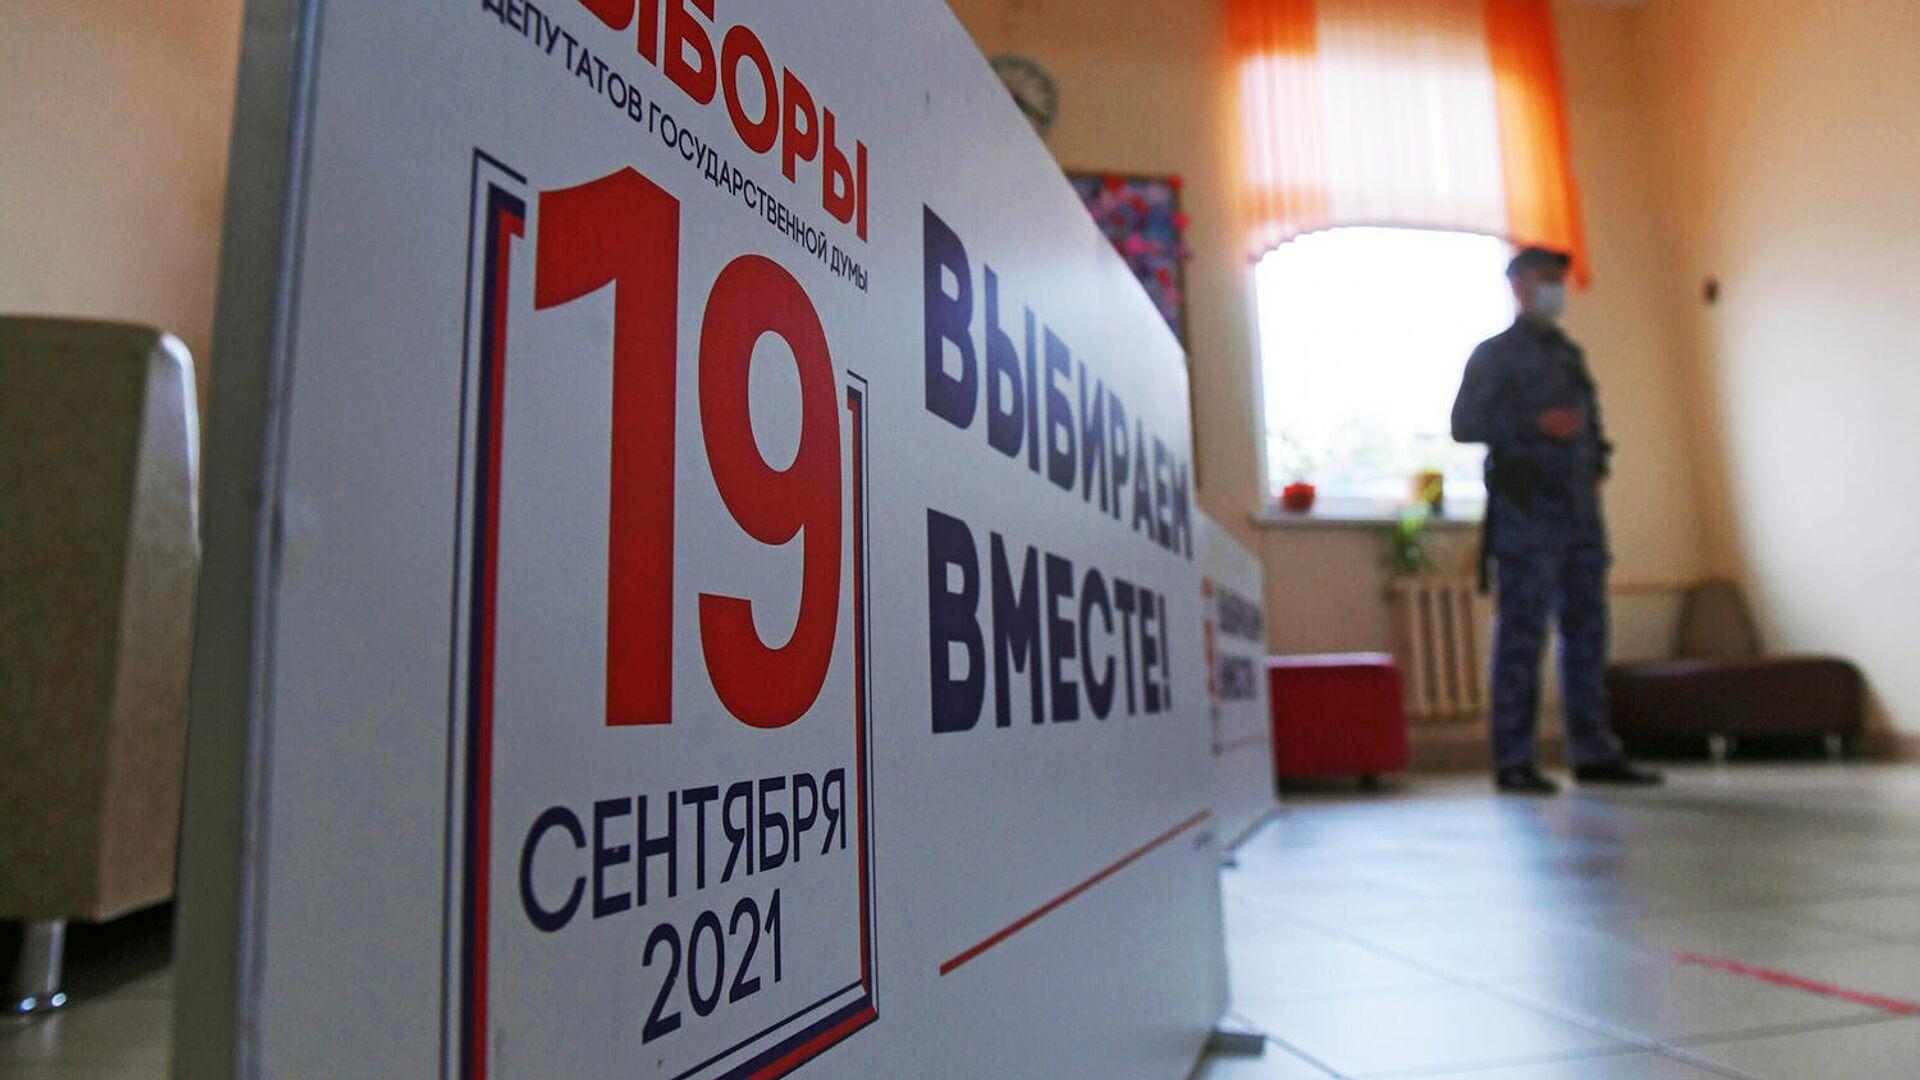 1750478723 0:167:1501:1011 1920x0 80 0 0 b93da610b7f3e7874b4395c5b0bf9241 - Глава Карачаево-Черкесии Рашид Темрезов проголосовал на выборах в Госдуму вместе с сыном